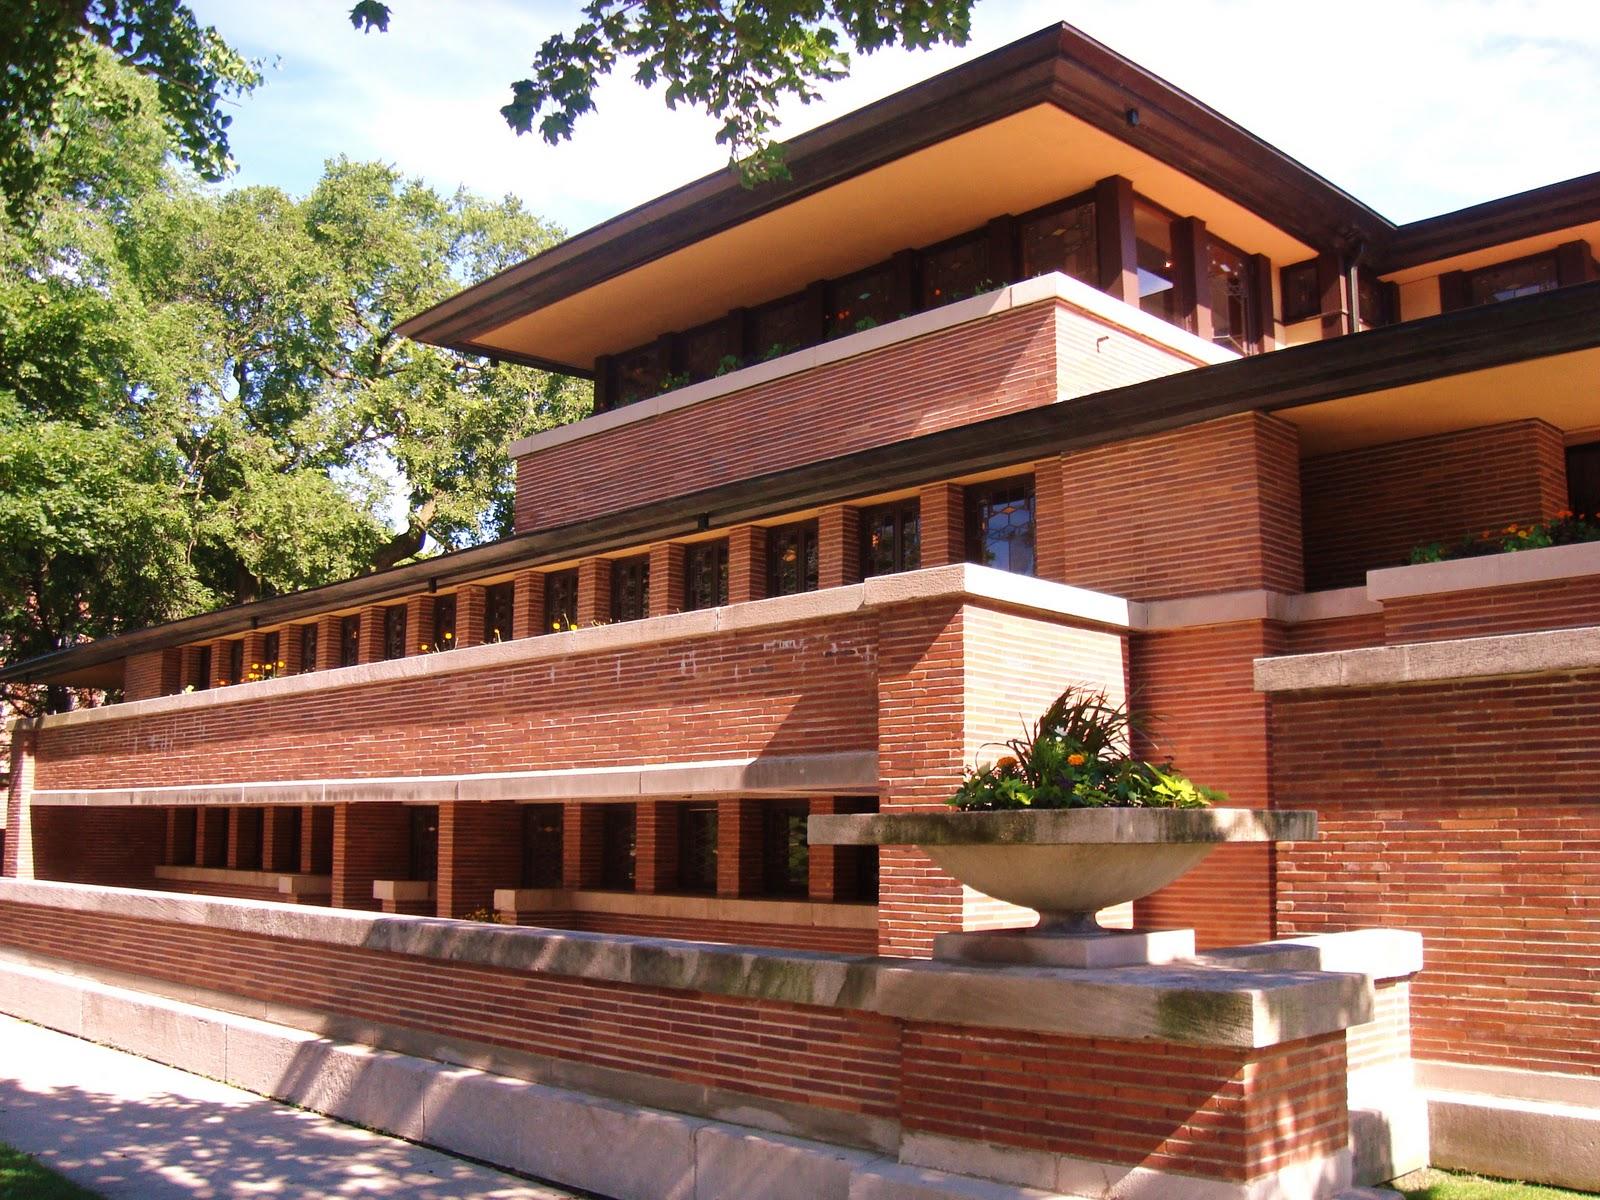 Frank Lloyd Wright Prairie Style Vormleer B5 Robie House Frank Lloyd Wright Week 2